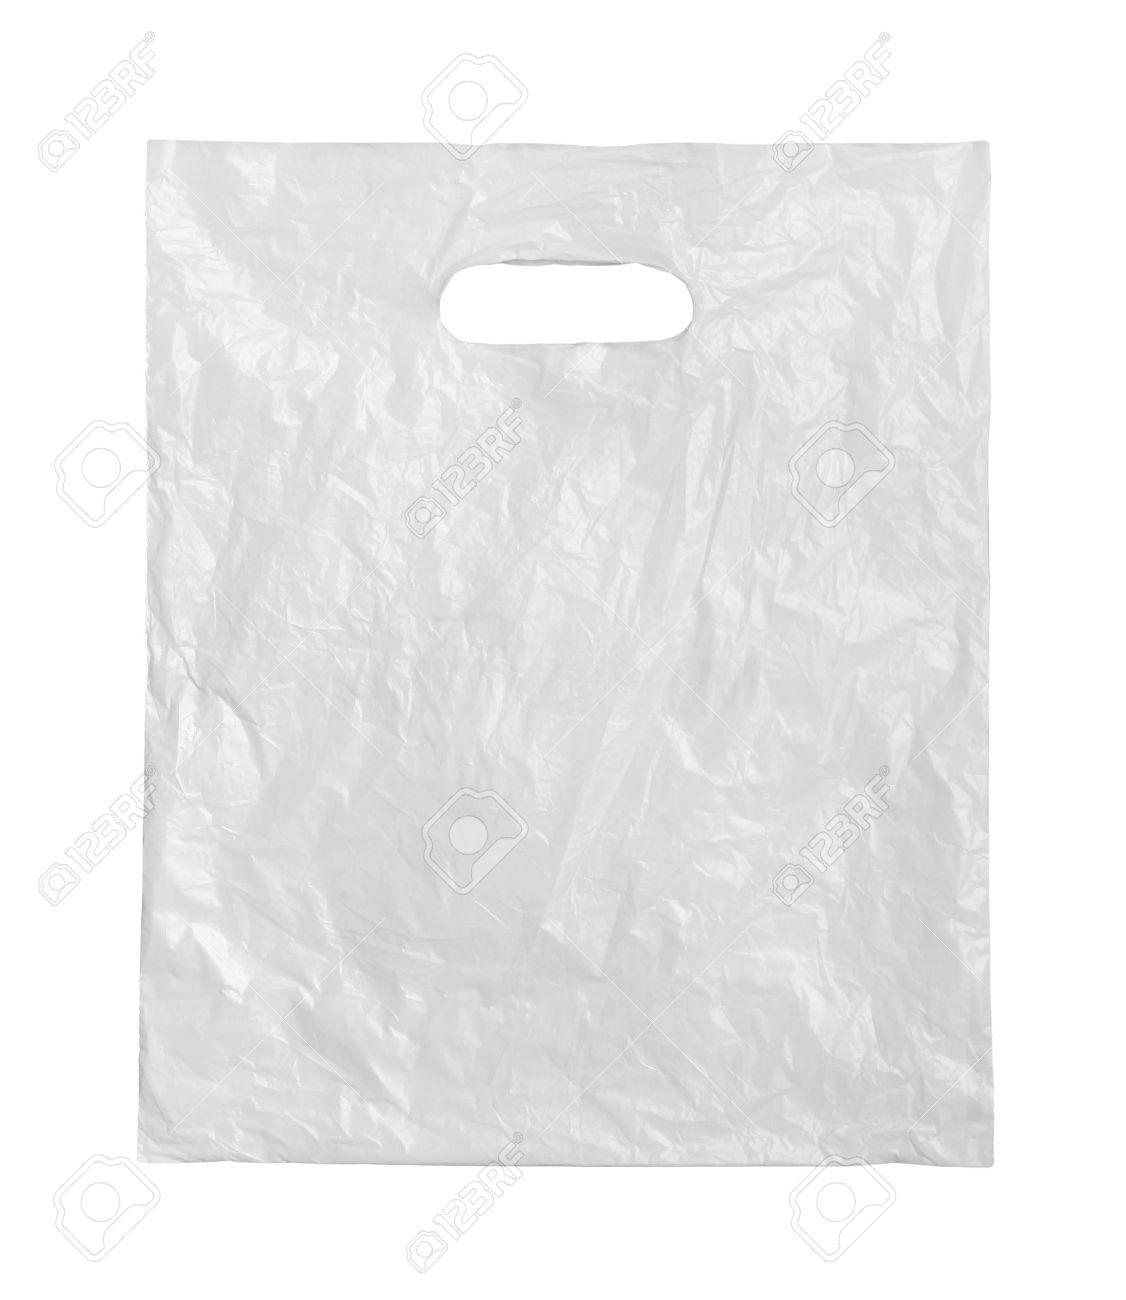 White plastic bag on a white background. Stock Photo - 13443222